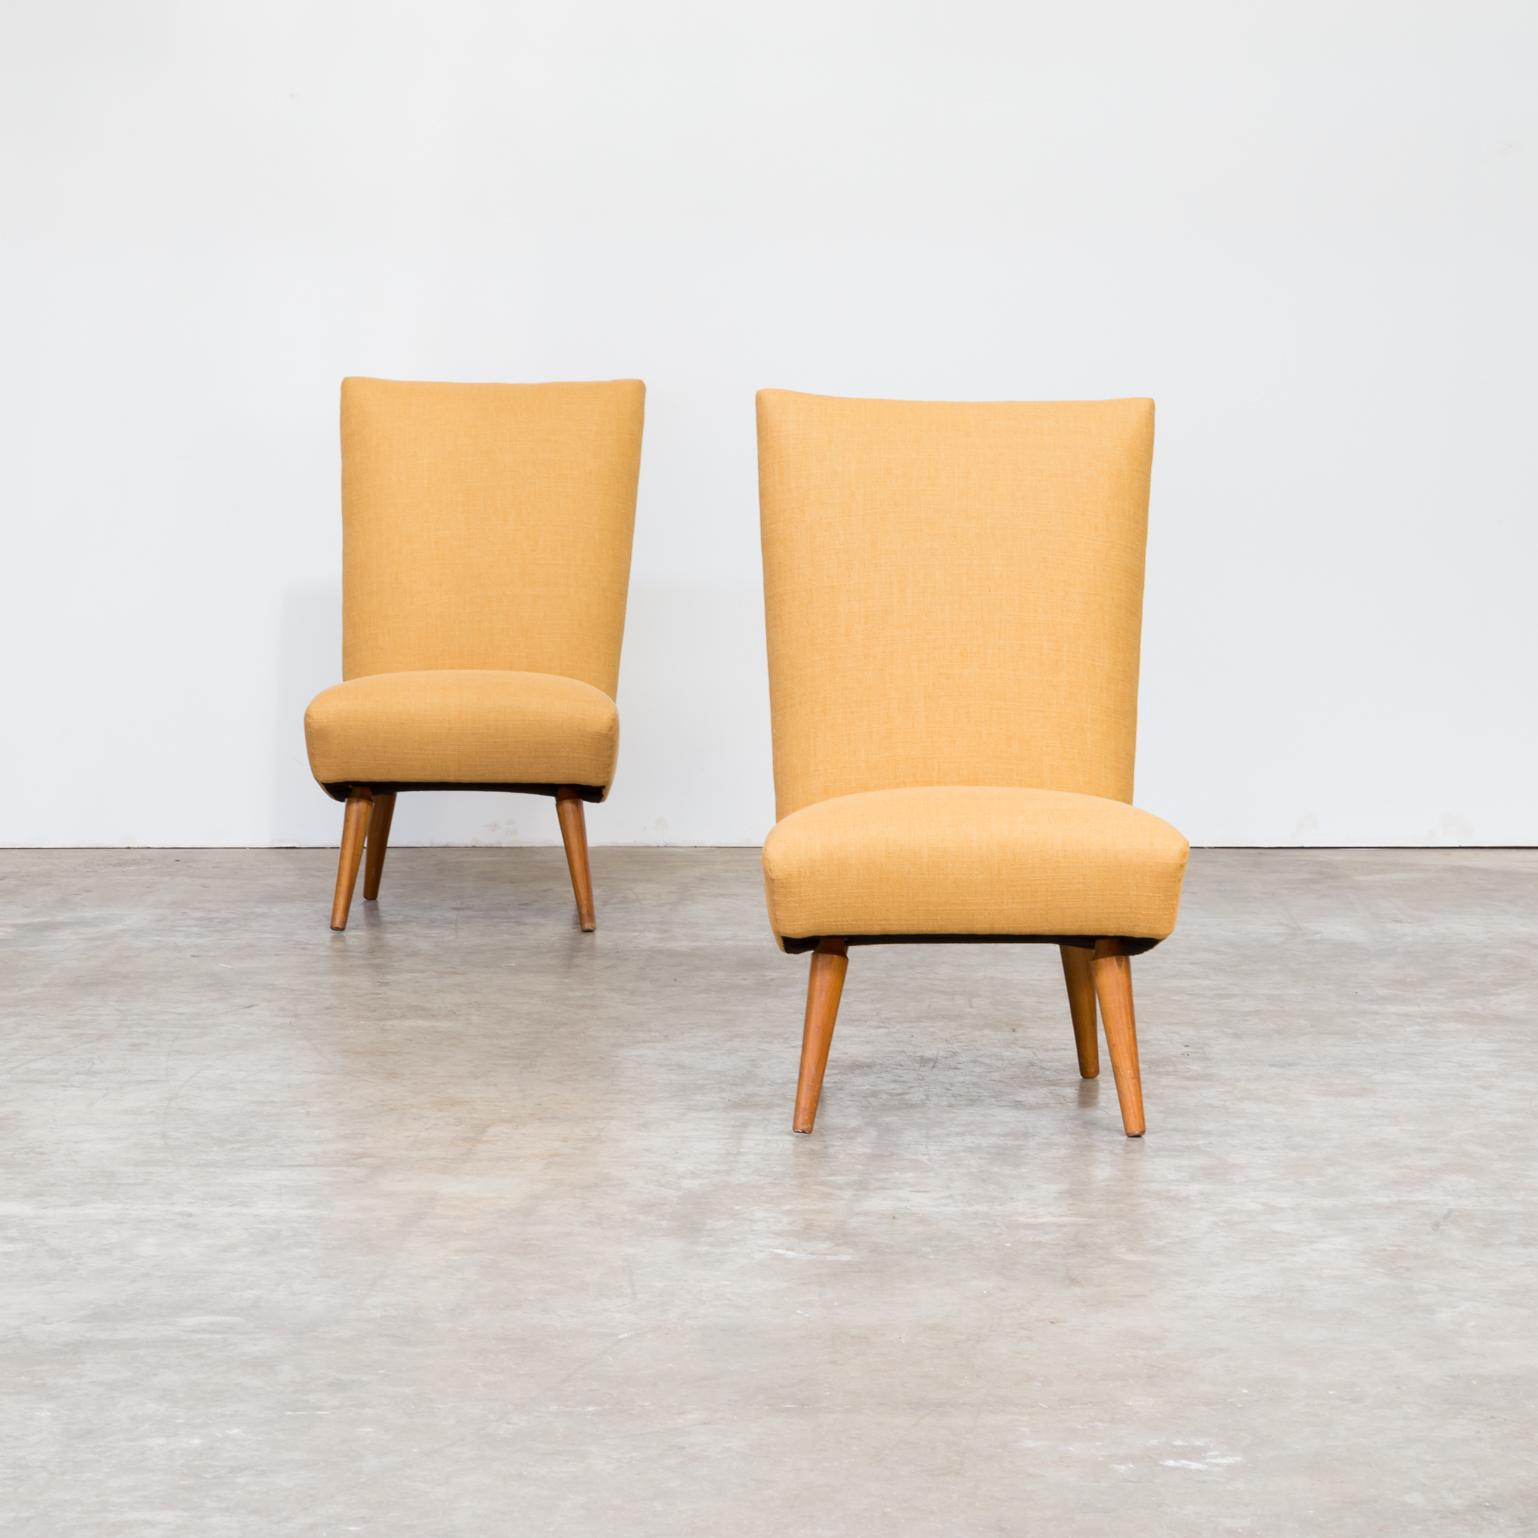 Fauteuil Retro Design.50s G Van Os Beautiful Pair New Upholstered Fauteuils For Van Os Culemborg Set 2